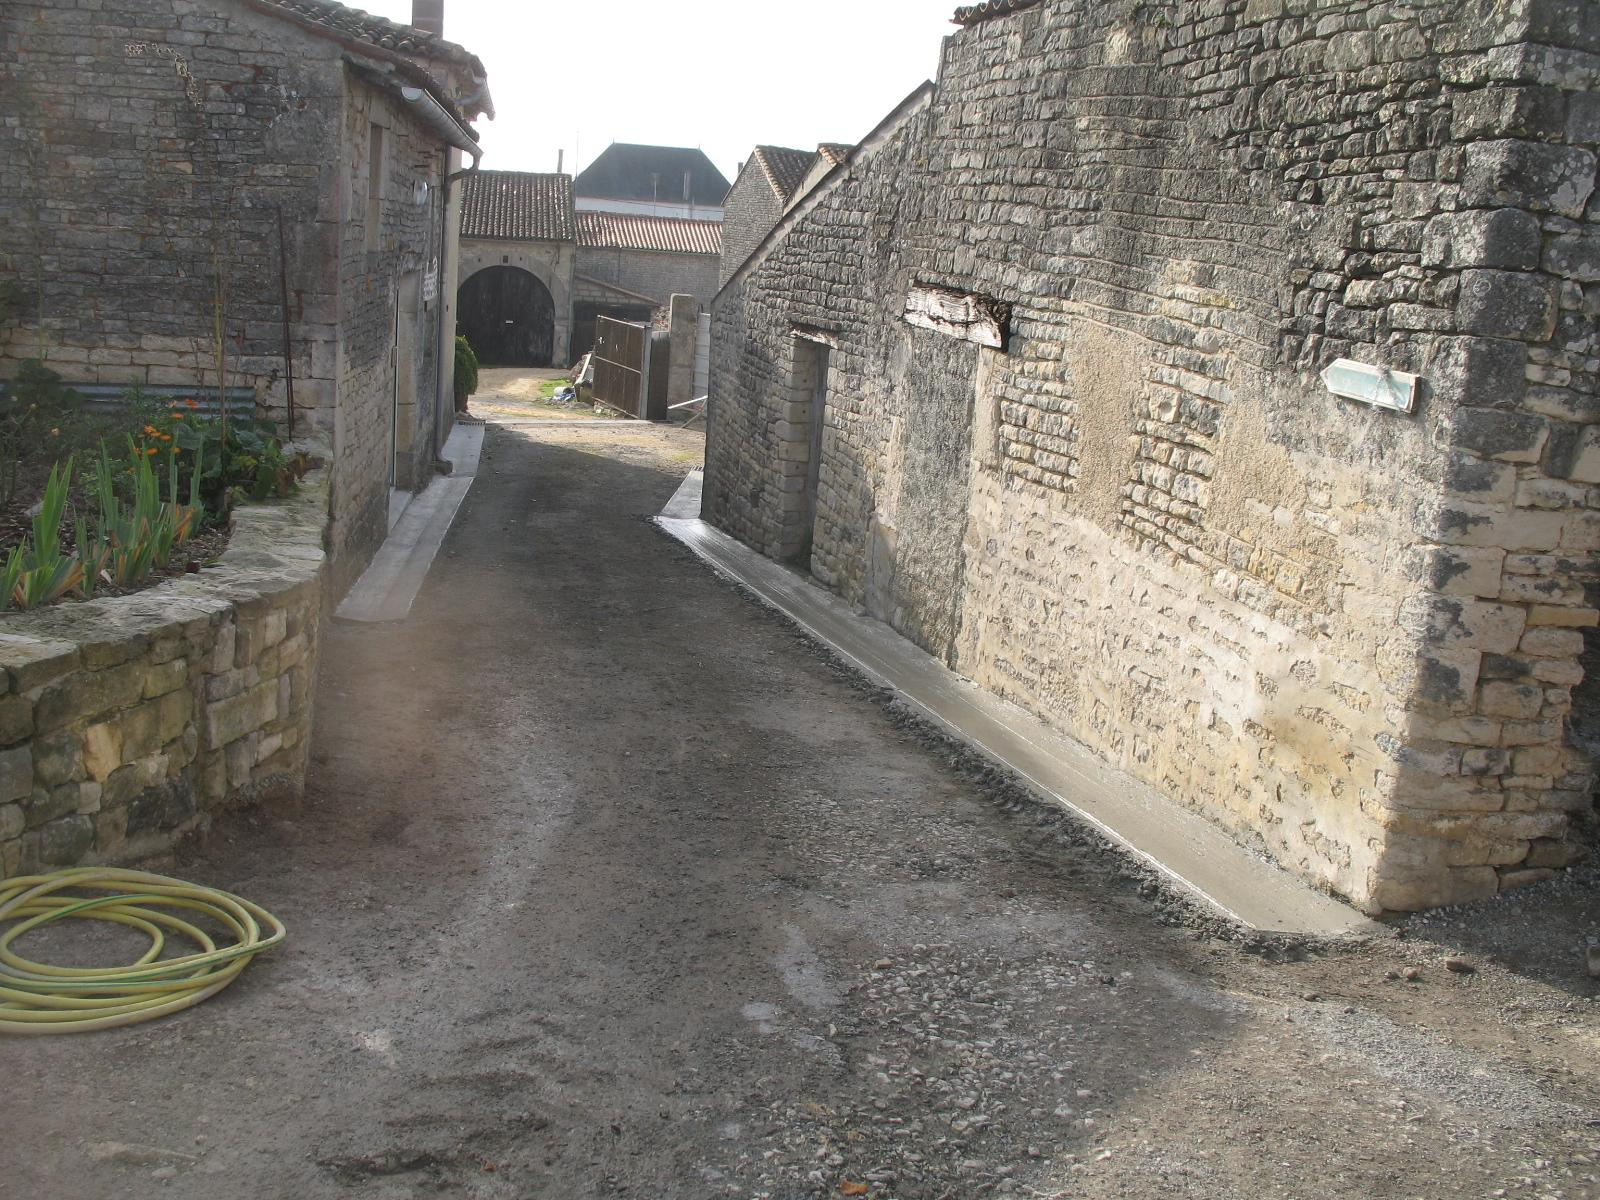 rue-de-la-treille-4